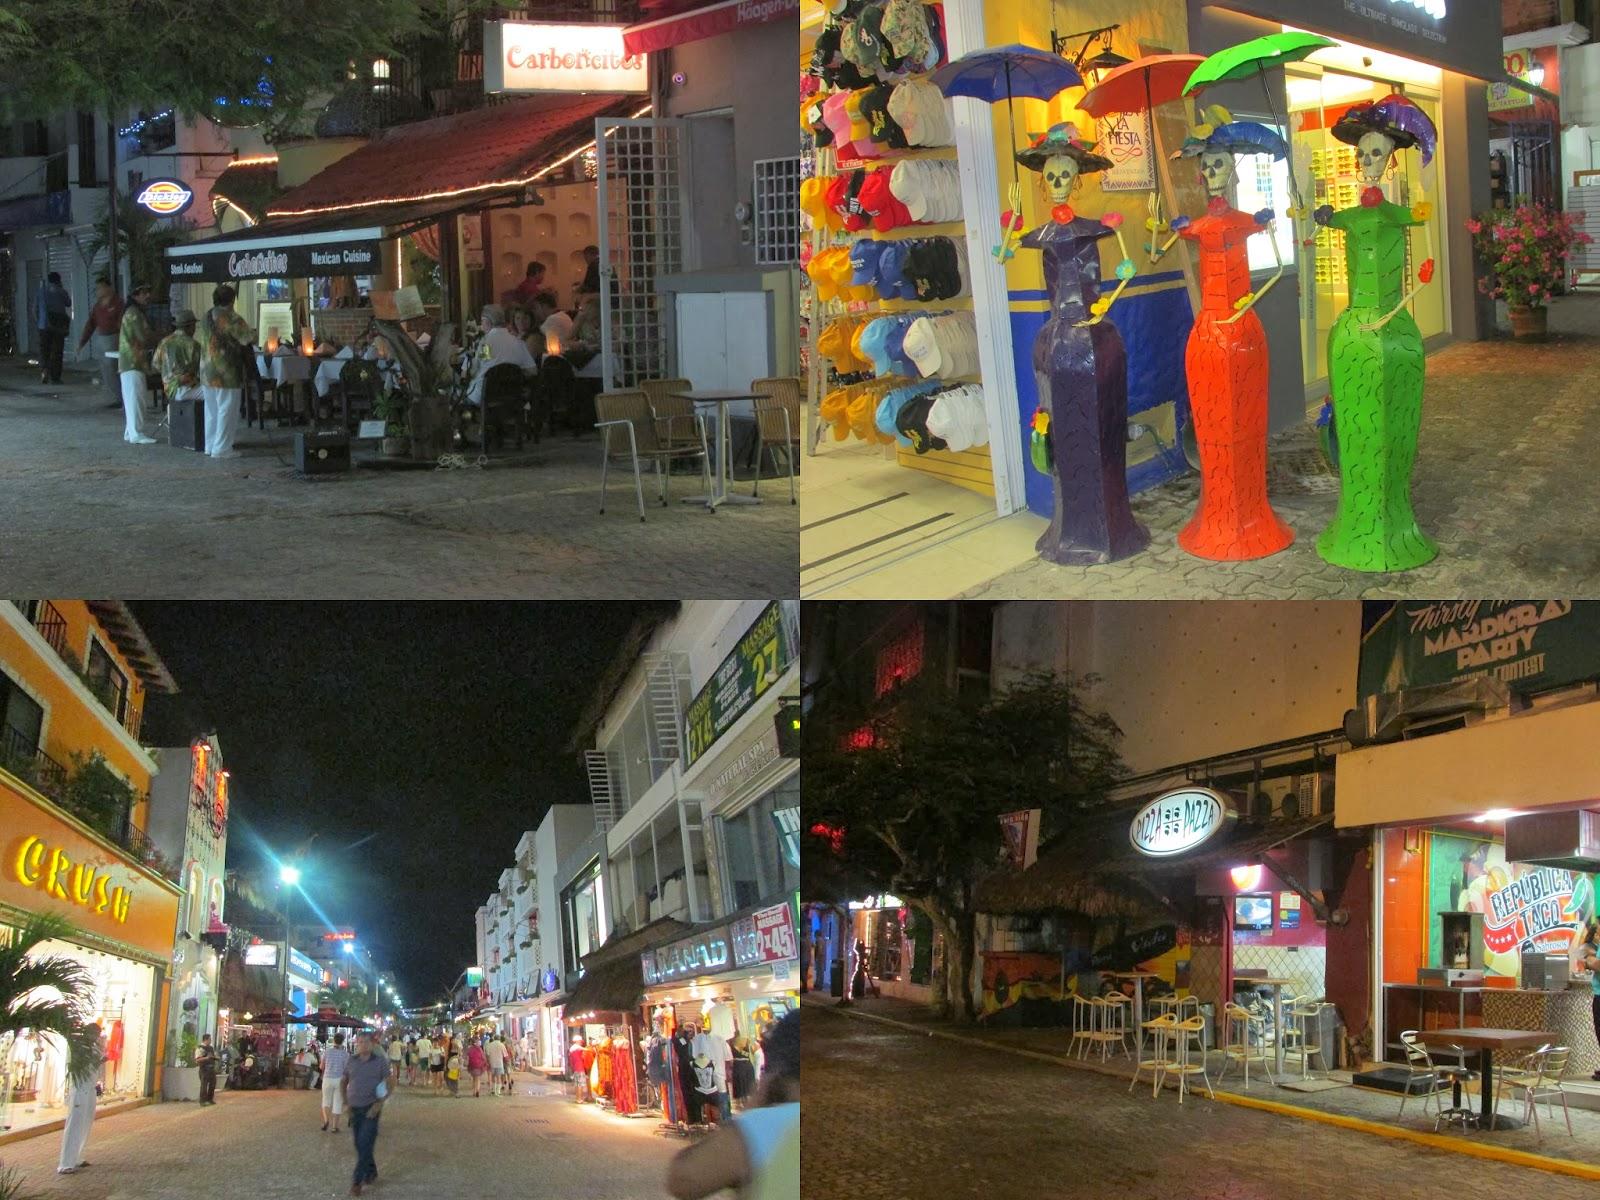 Playa Del Carmen, México, Caribe, 5ª Avenida, centrinho